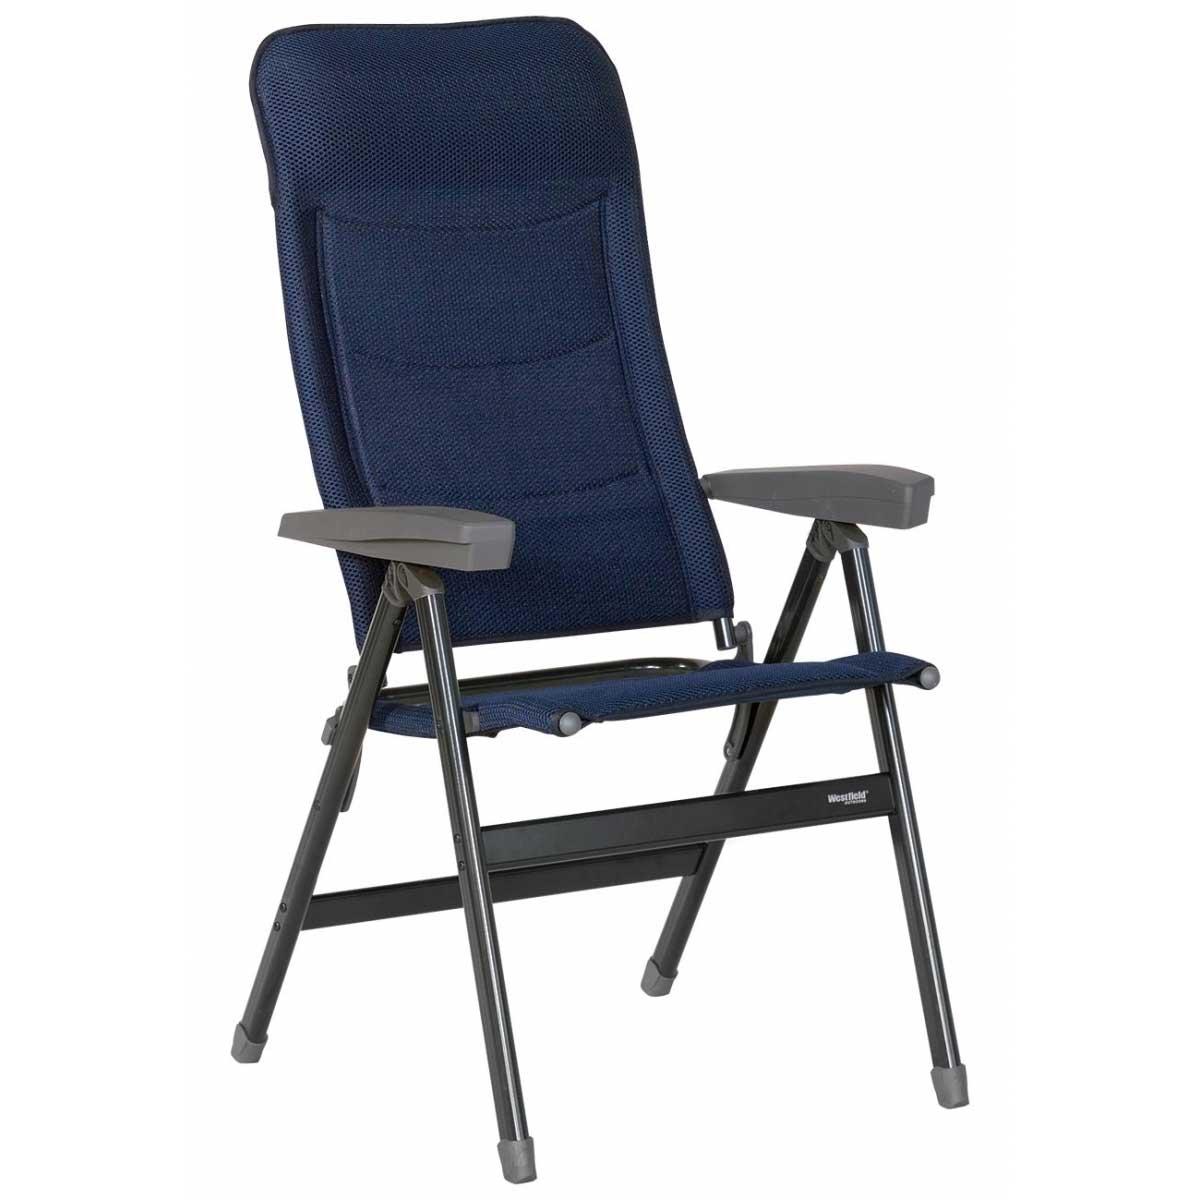 Gartenstuhl Campingstuhl WESTFIELD Advancer Klappsessel dark blau